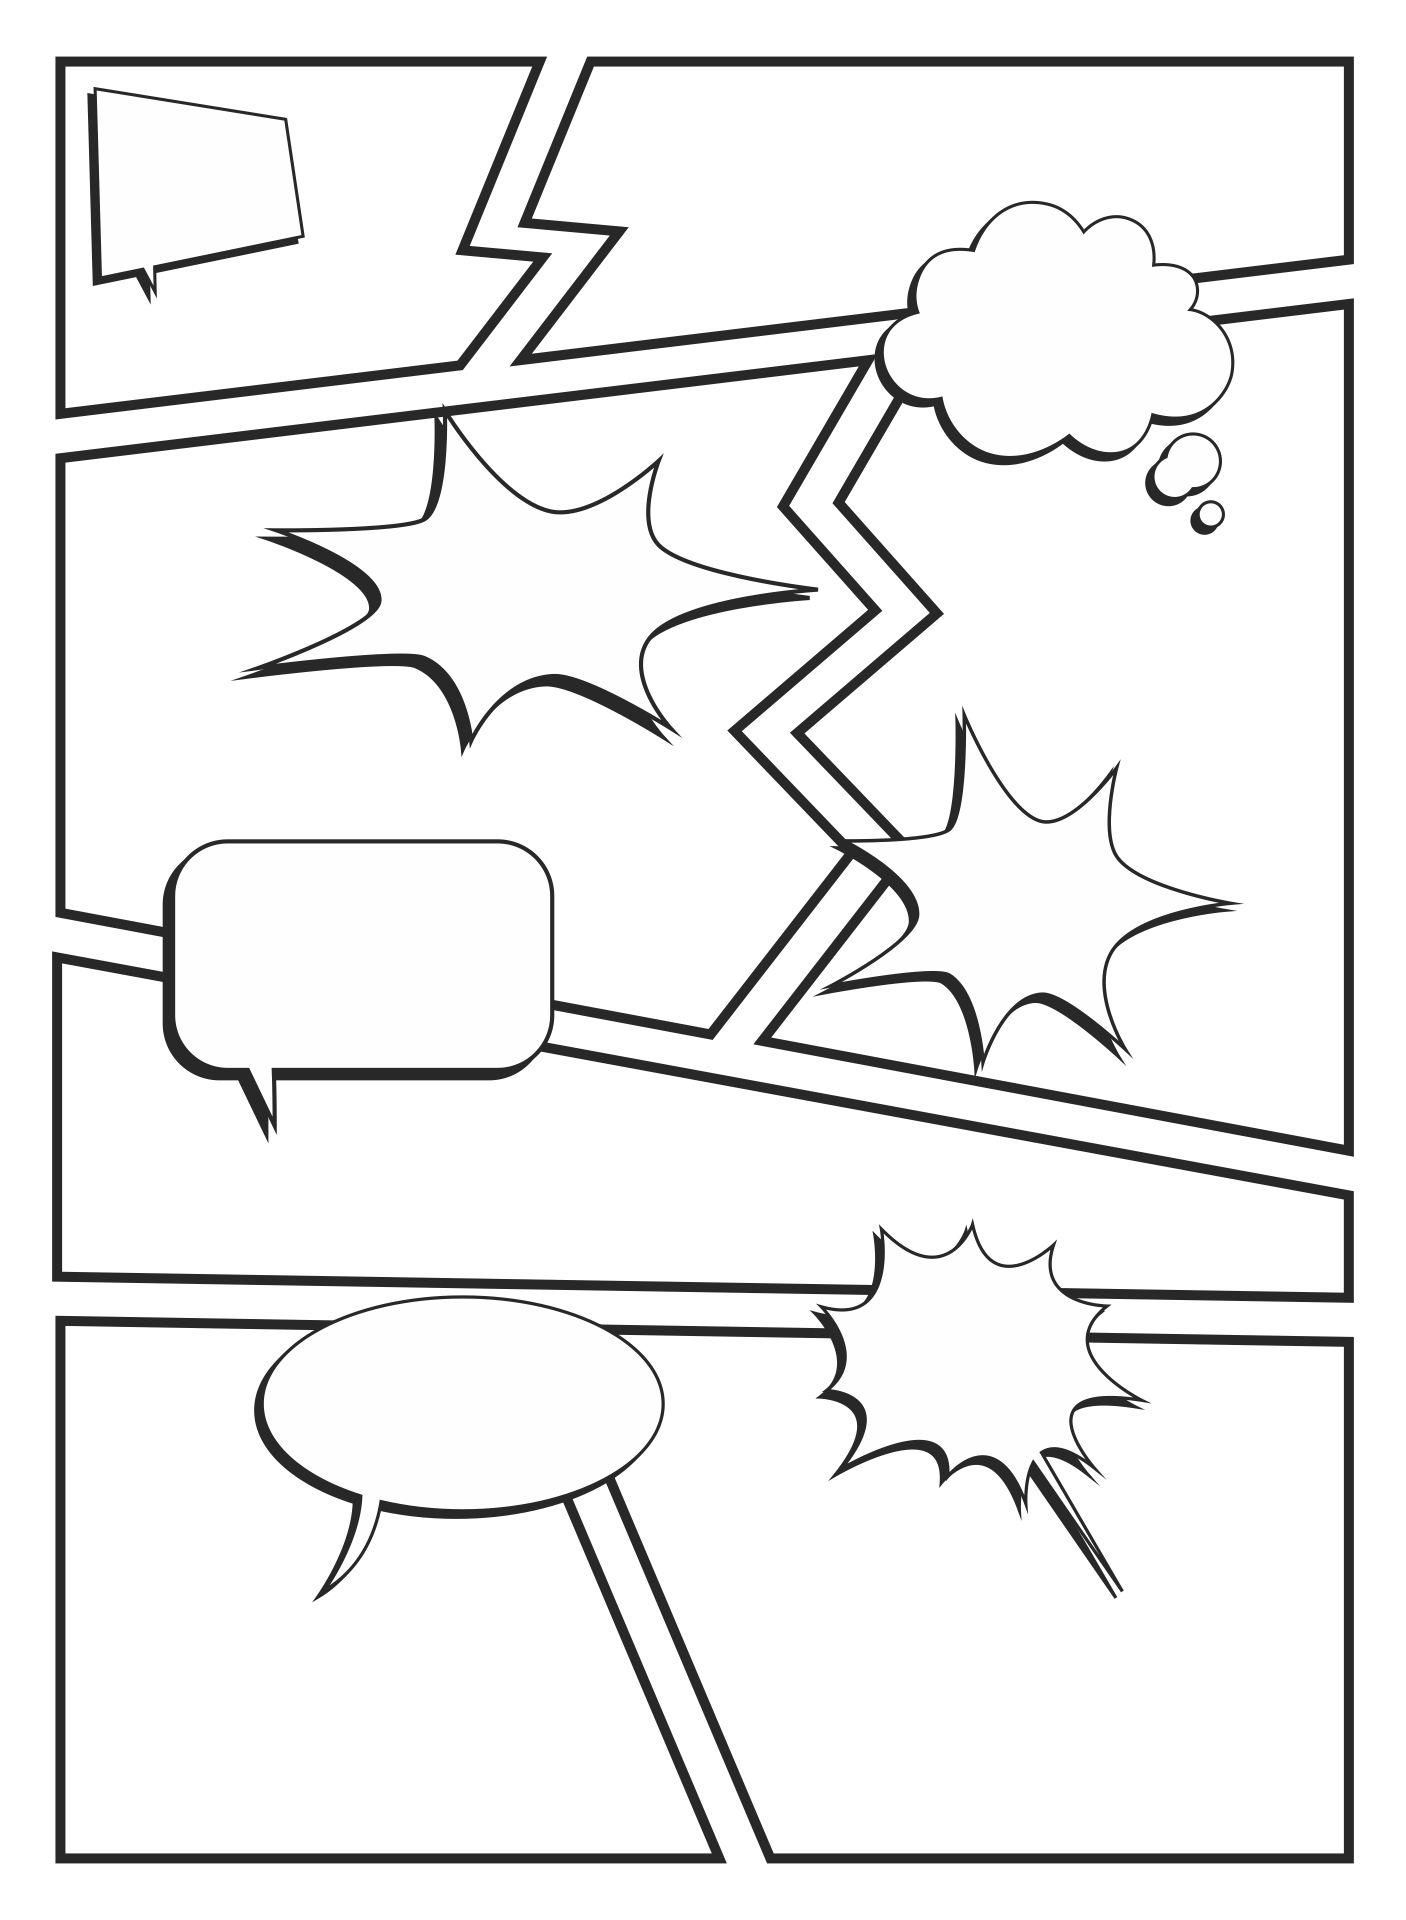 Comic Strip Template for Kids